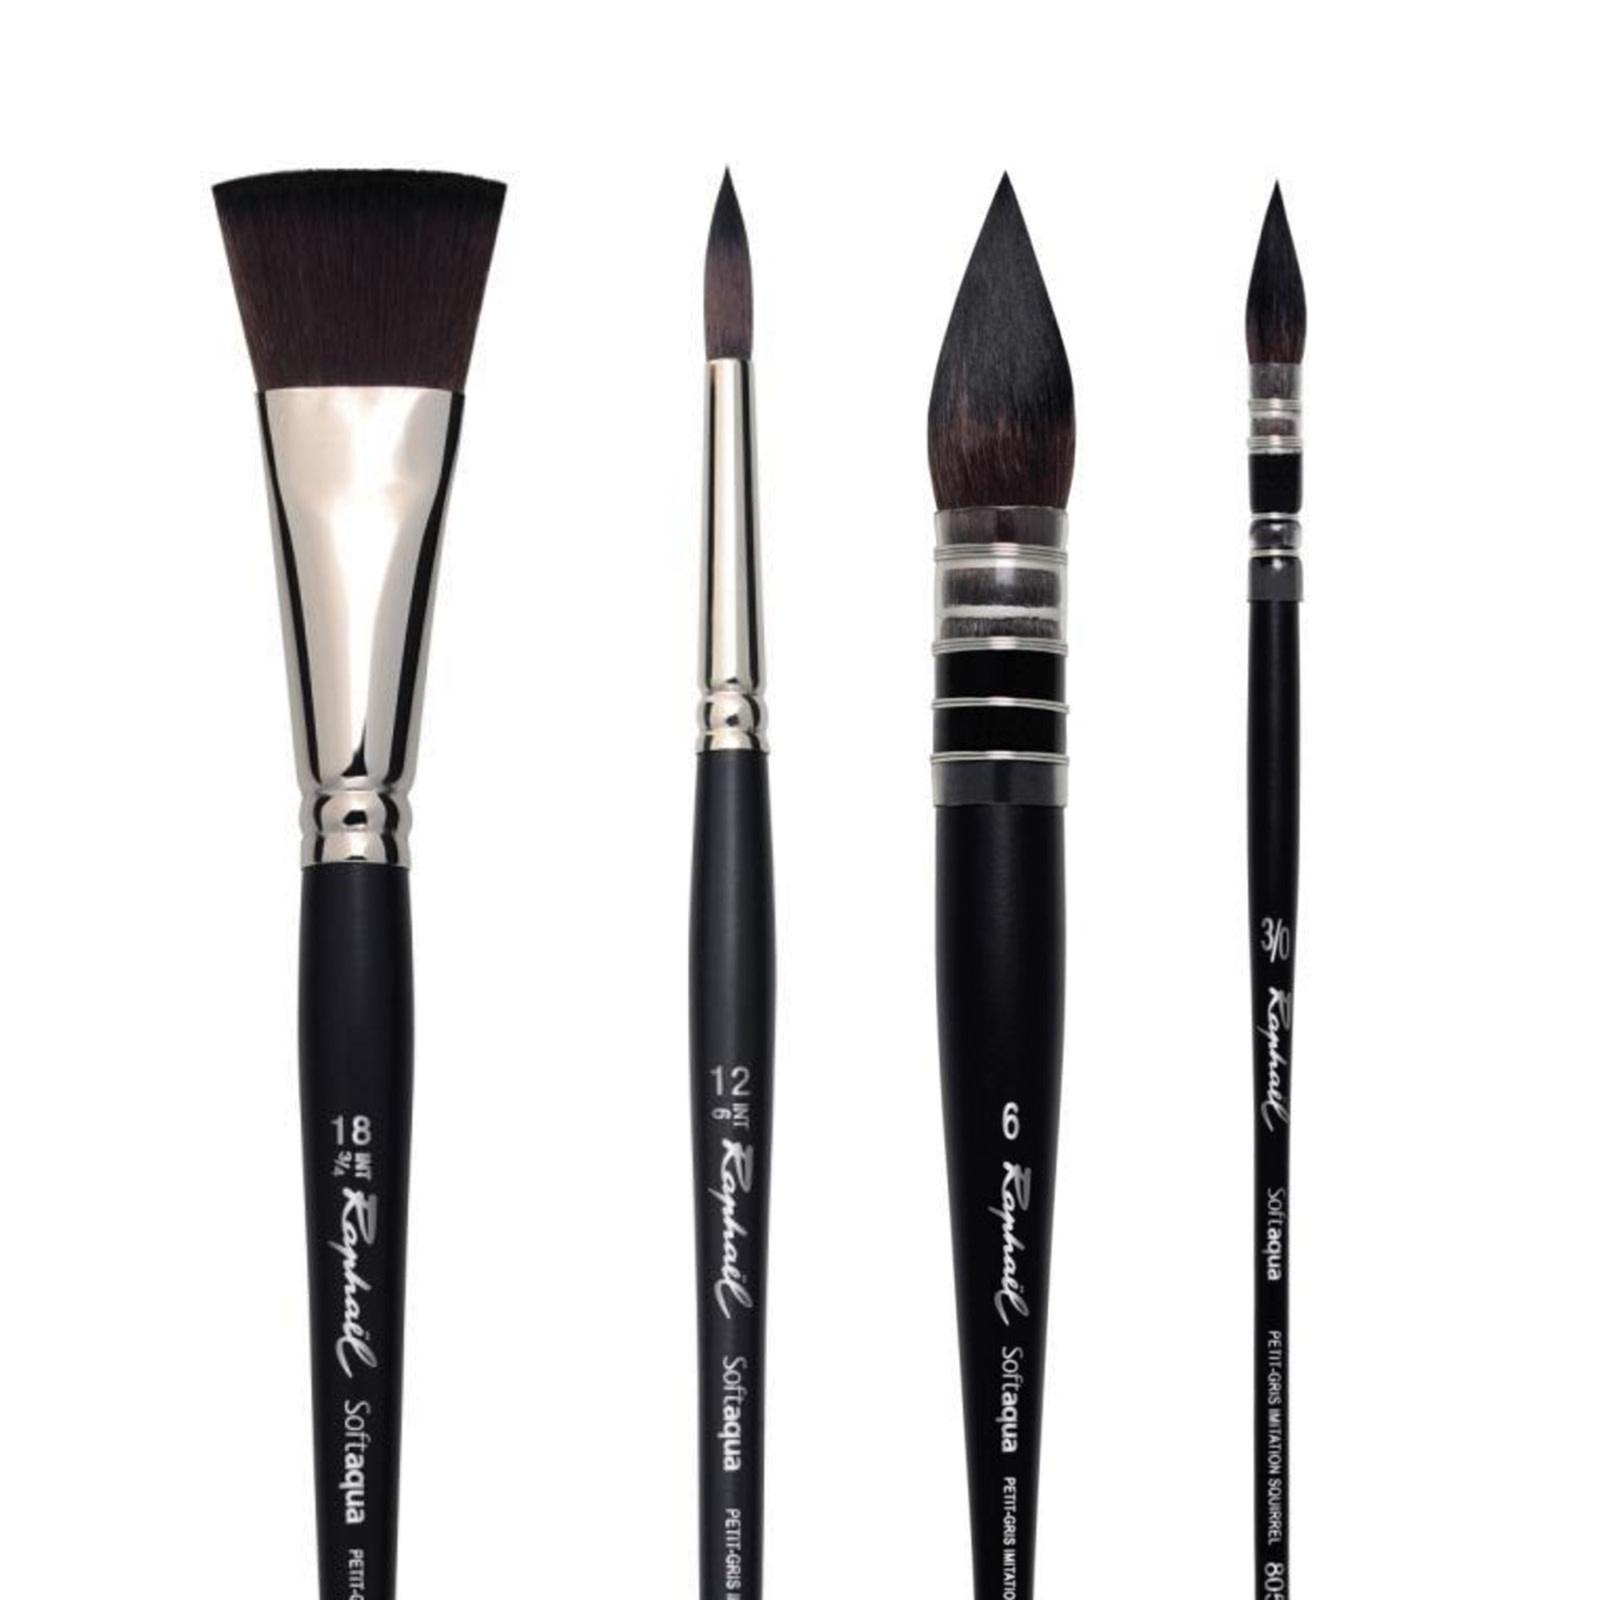 Savoir Faire SoftAqua Quill Brush - Size 02